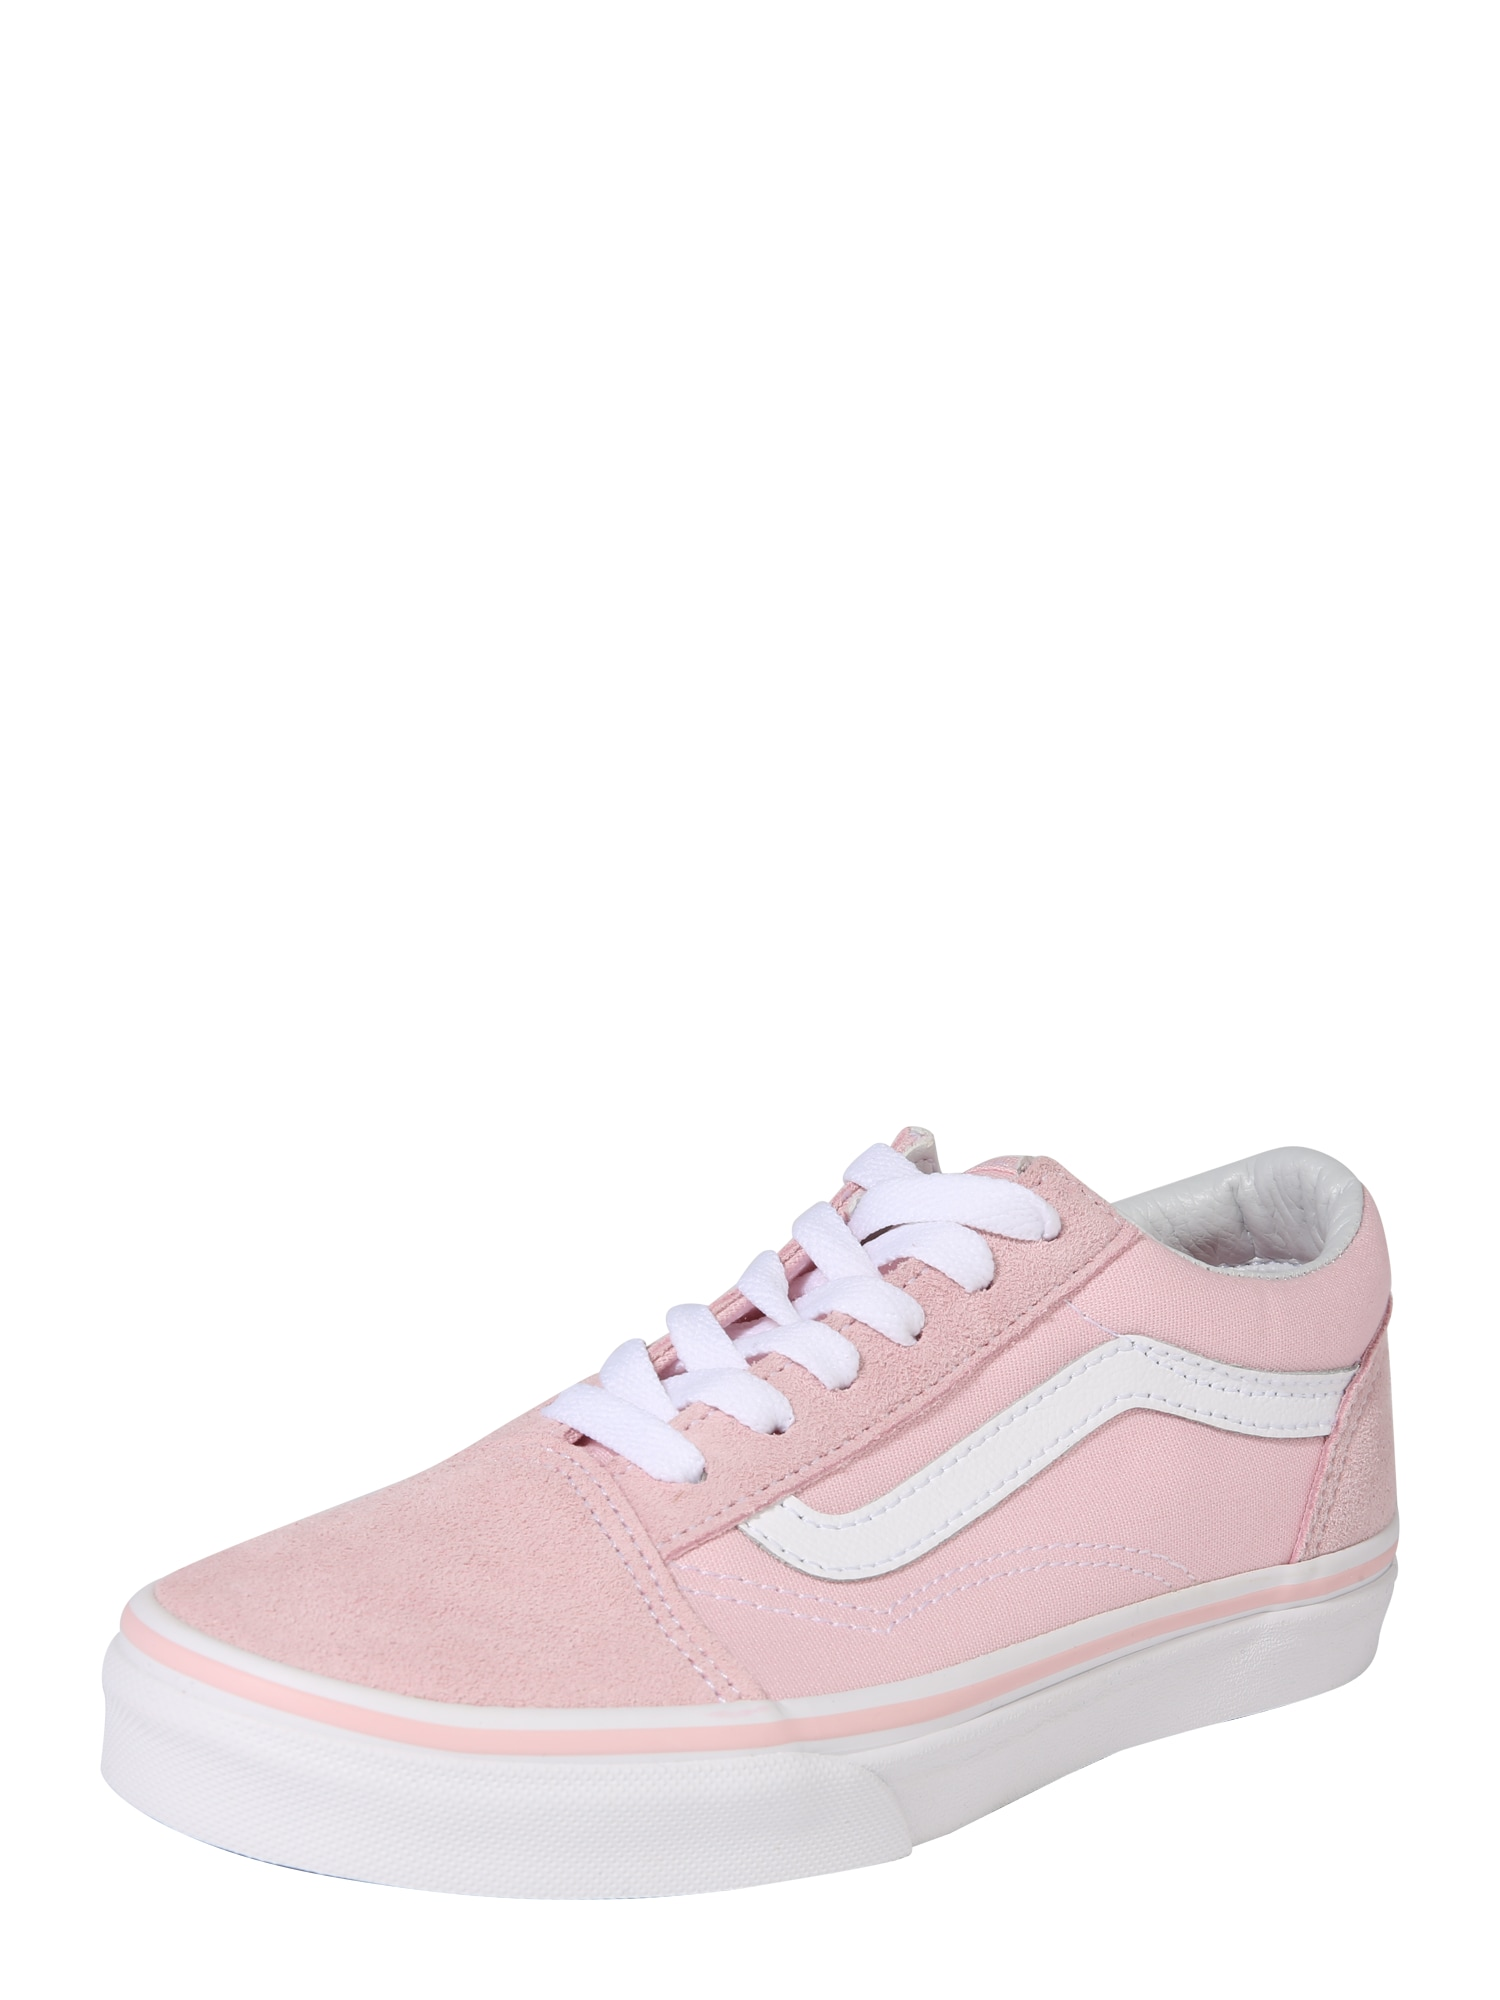 VANS, Jongens Sneakers 'Old Skool', rosa / wit